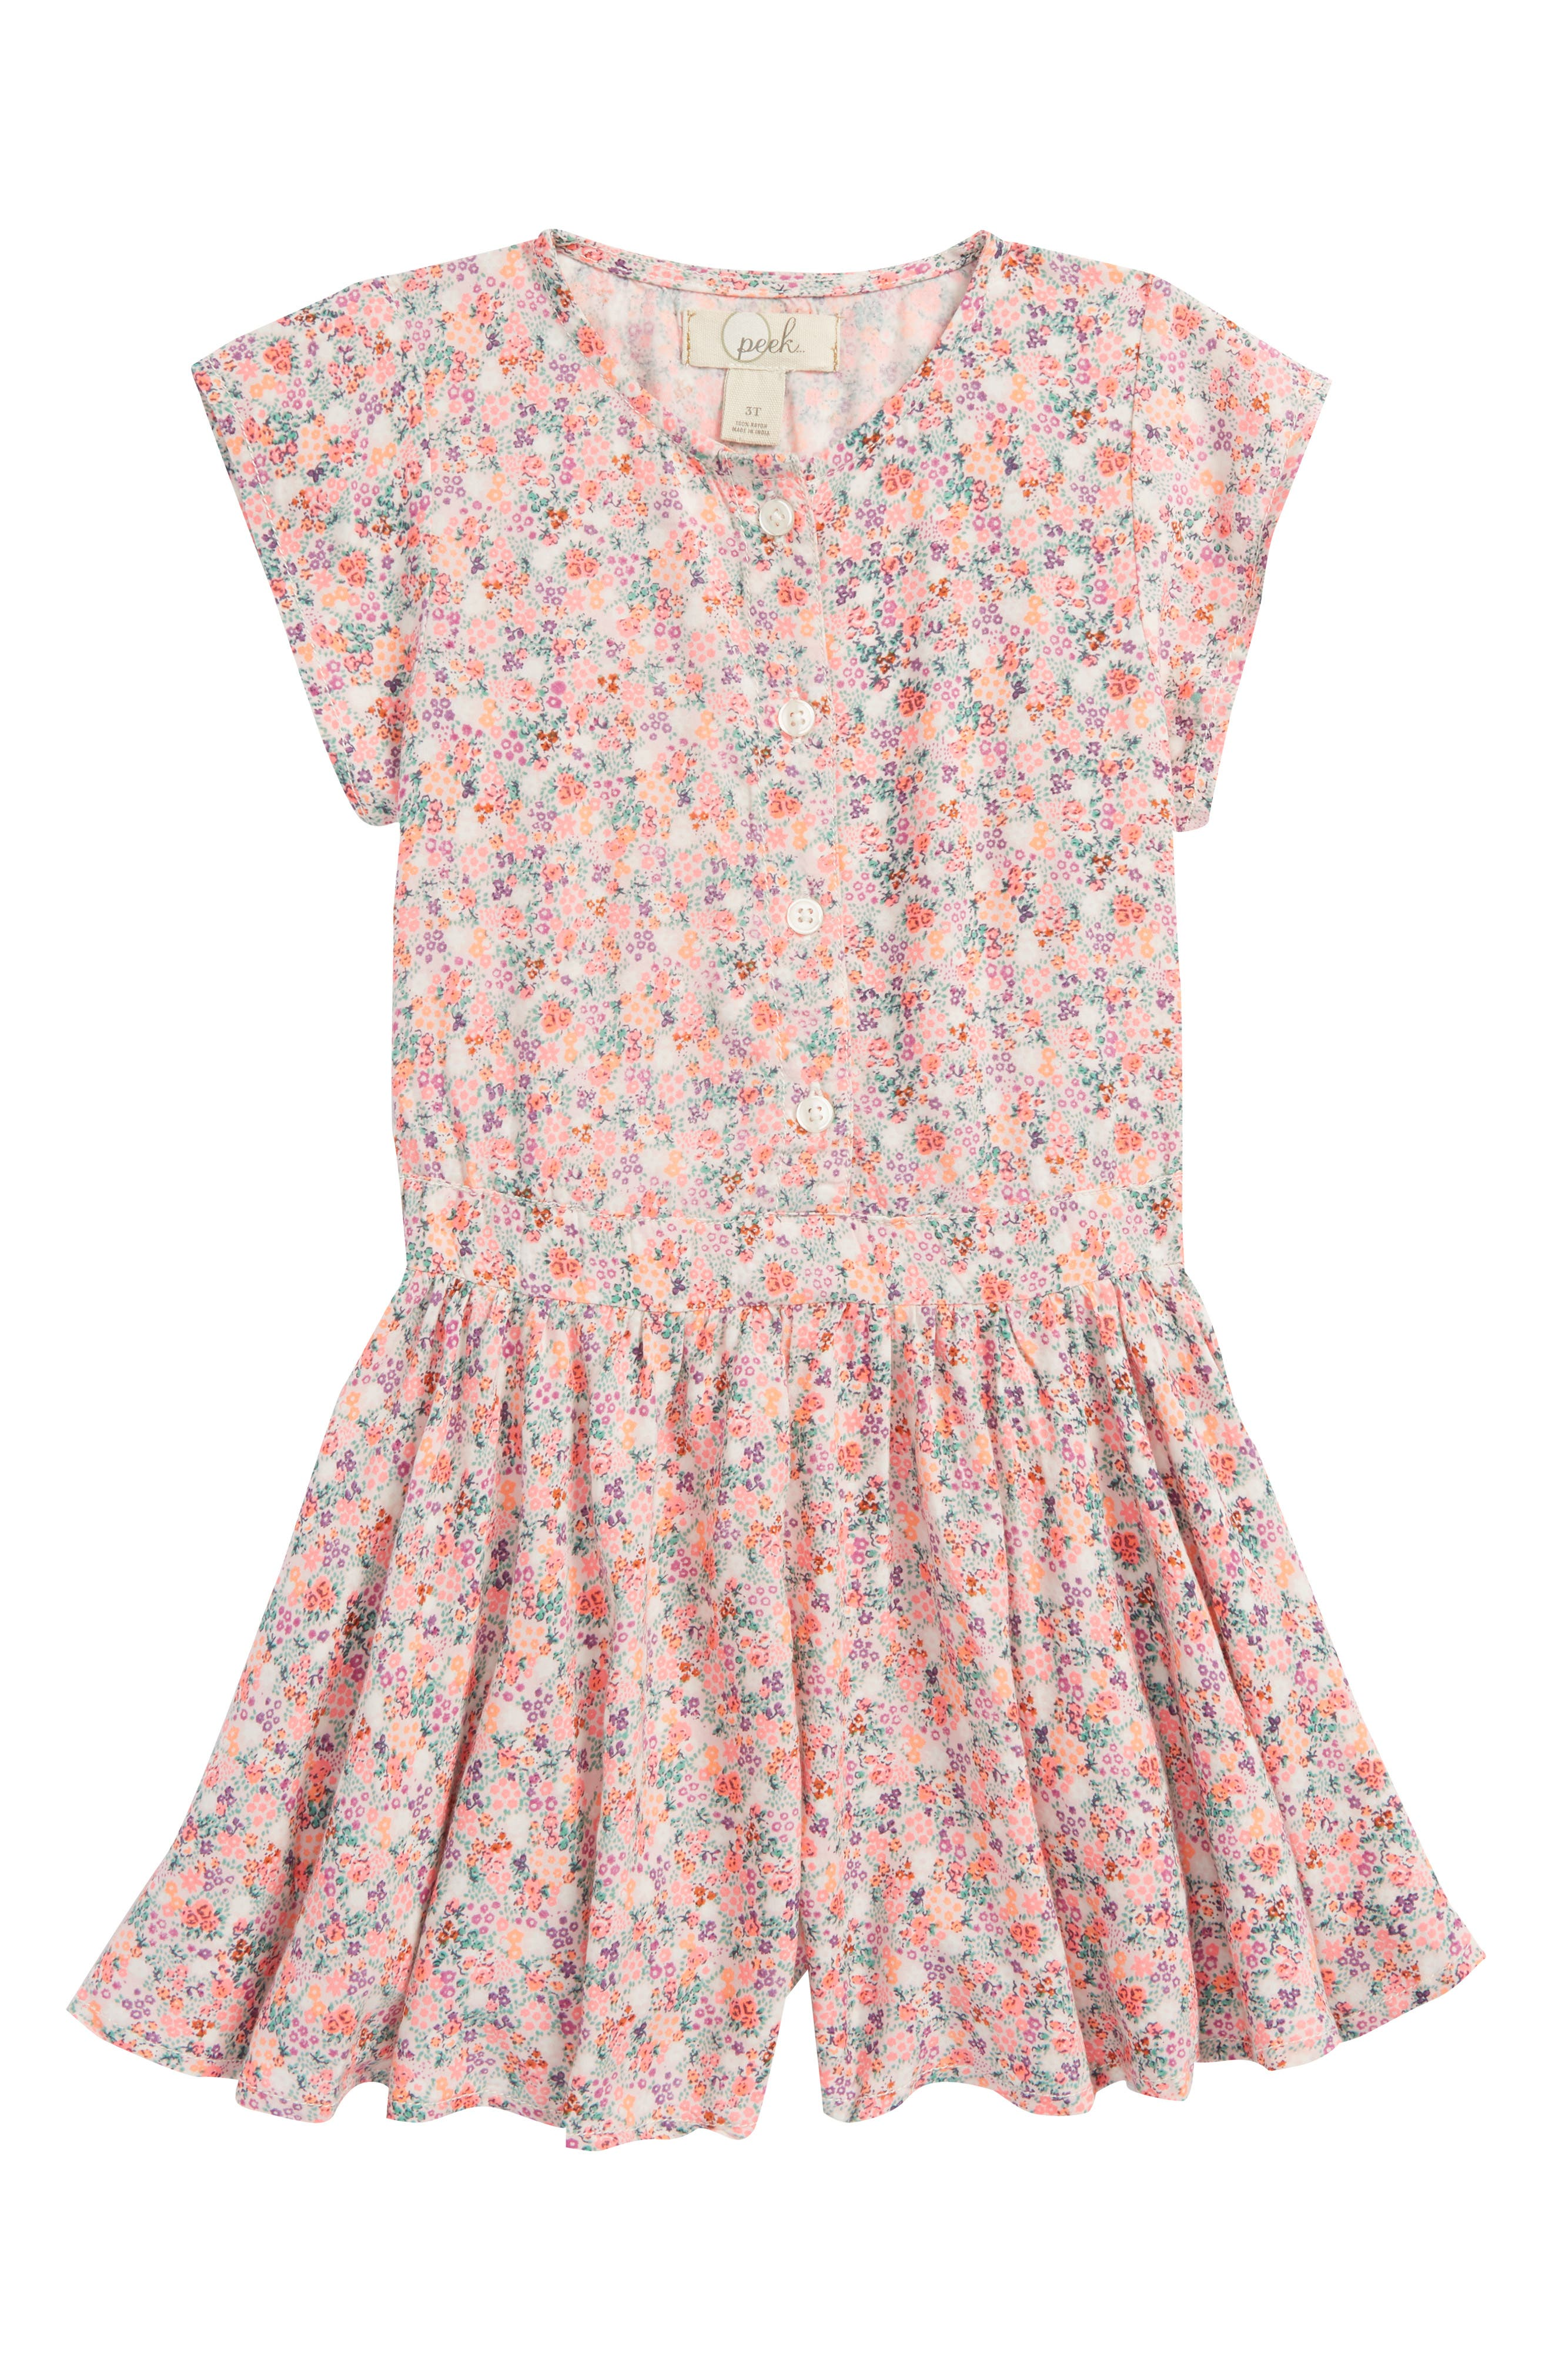 Main Image - Peek Lenora Floral Romper (Toddler Girls, Little Girls & Big Girls)